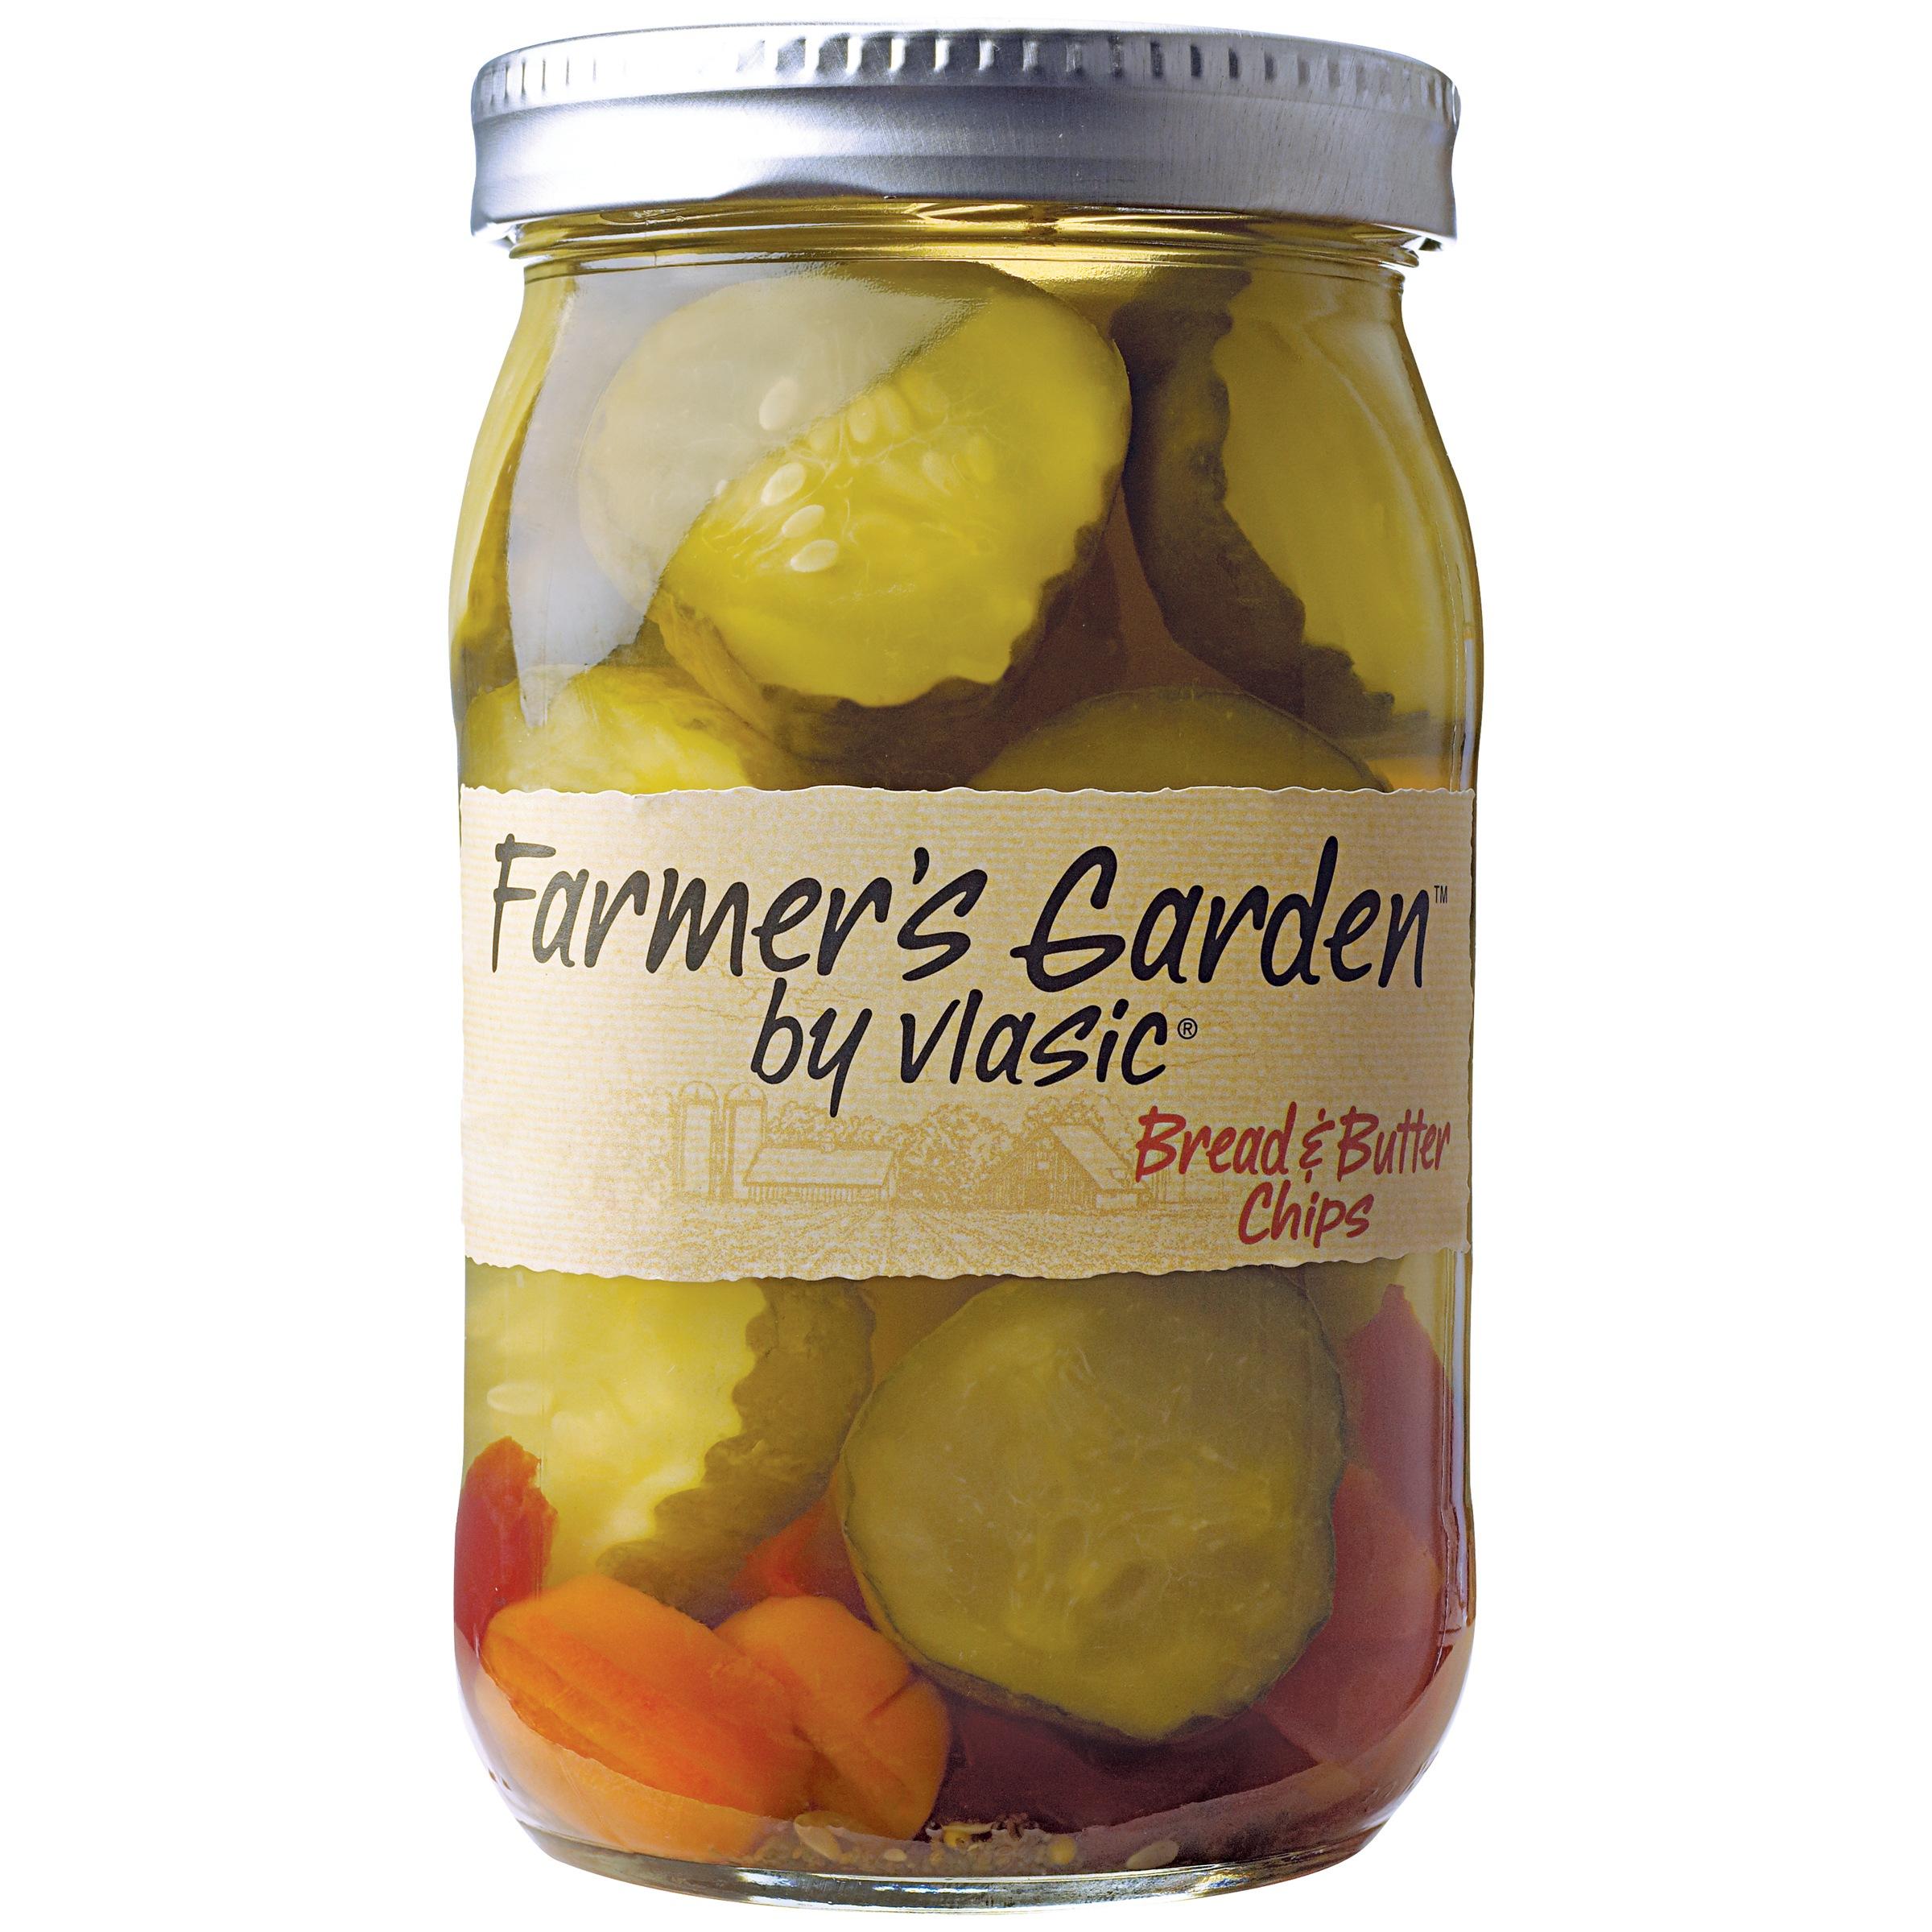 Farmer's Garden By Vlasic Bread & Butter Chips, 26.0 FL OZ